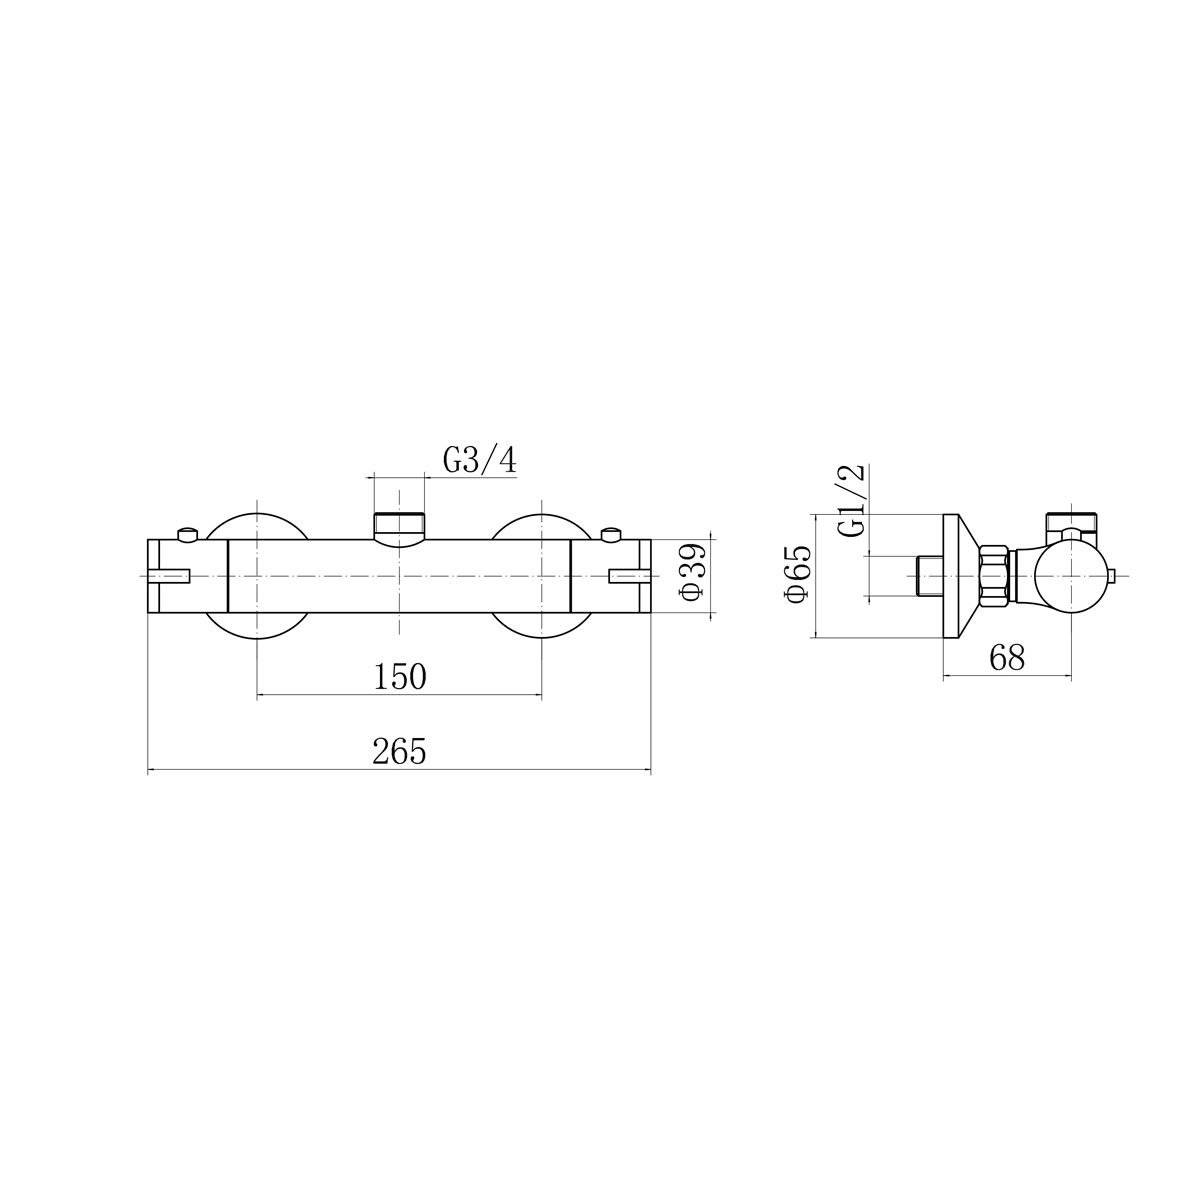 rondoroundthermostaticbarvalveshowersystemtech1